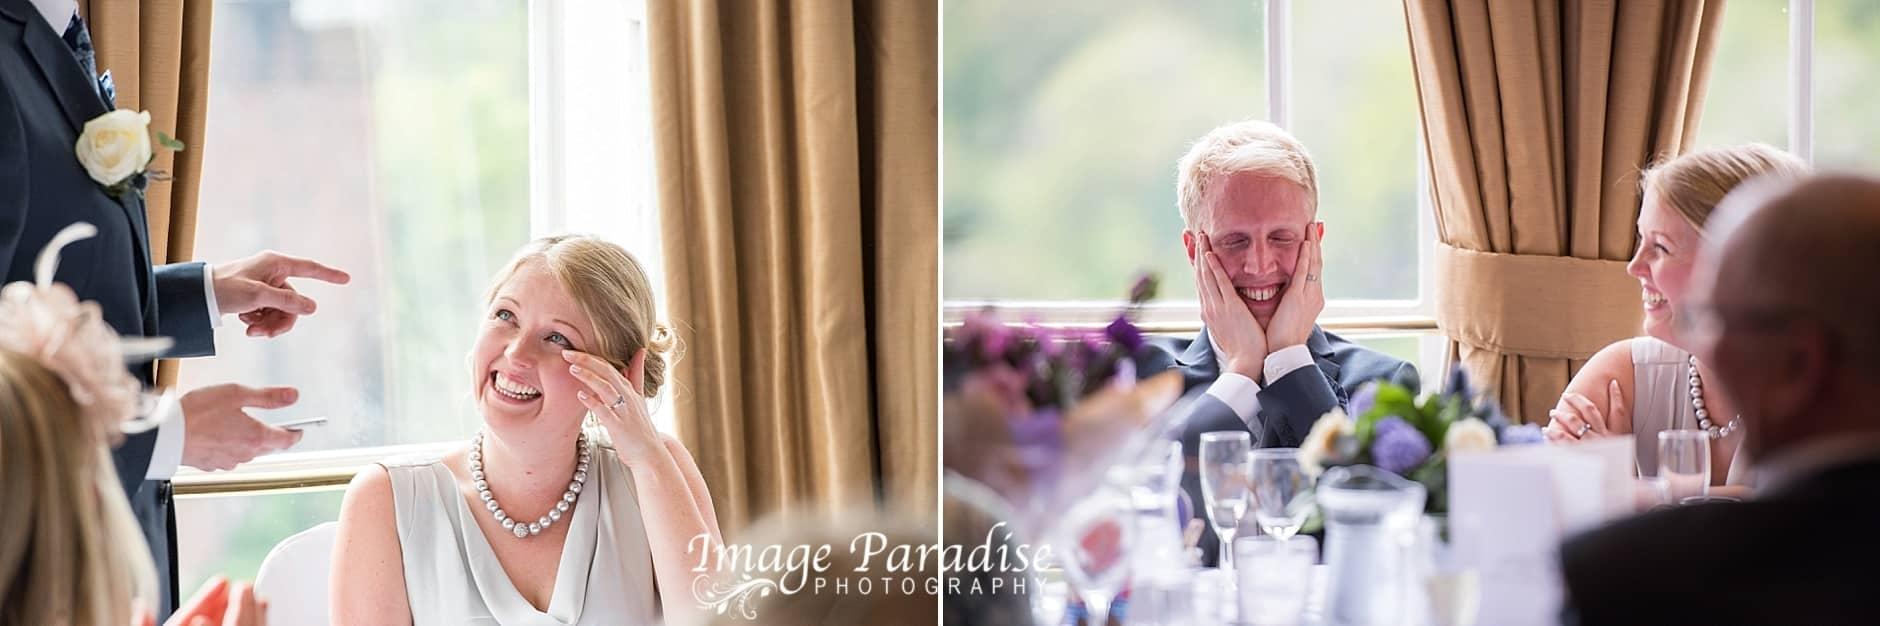 Bride & Groom during the wedding speeches at Avon Gorge Hotel